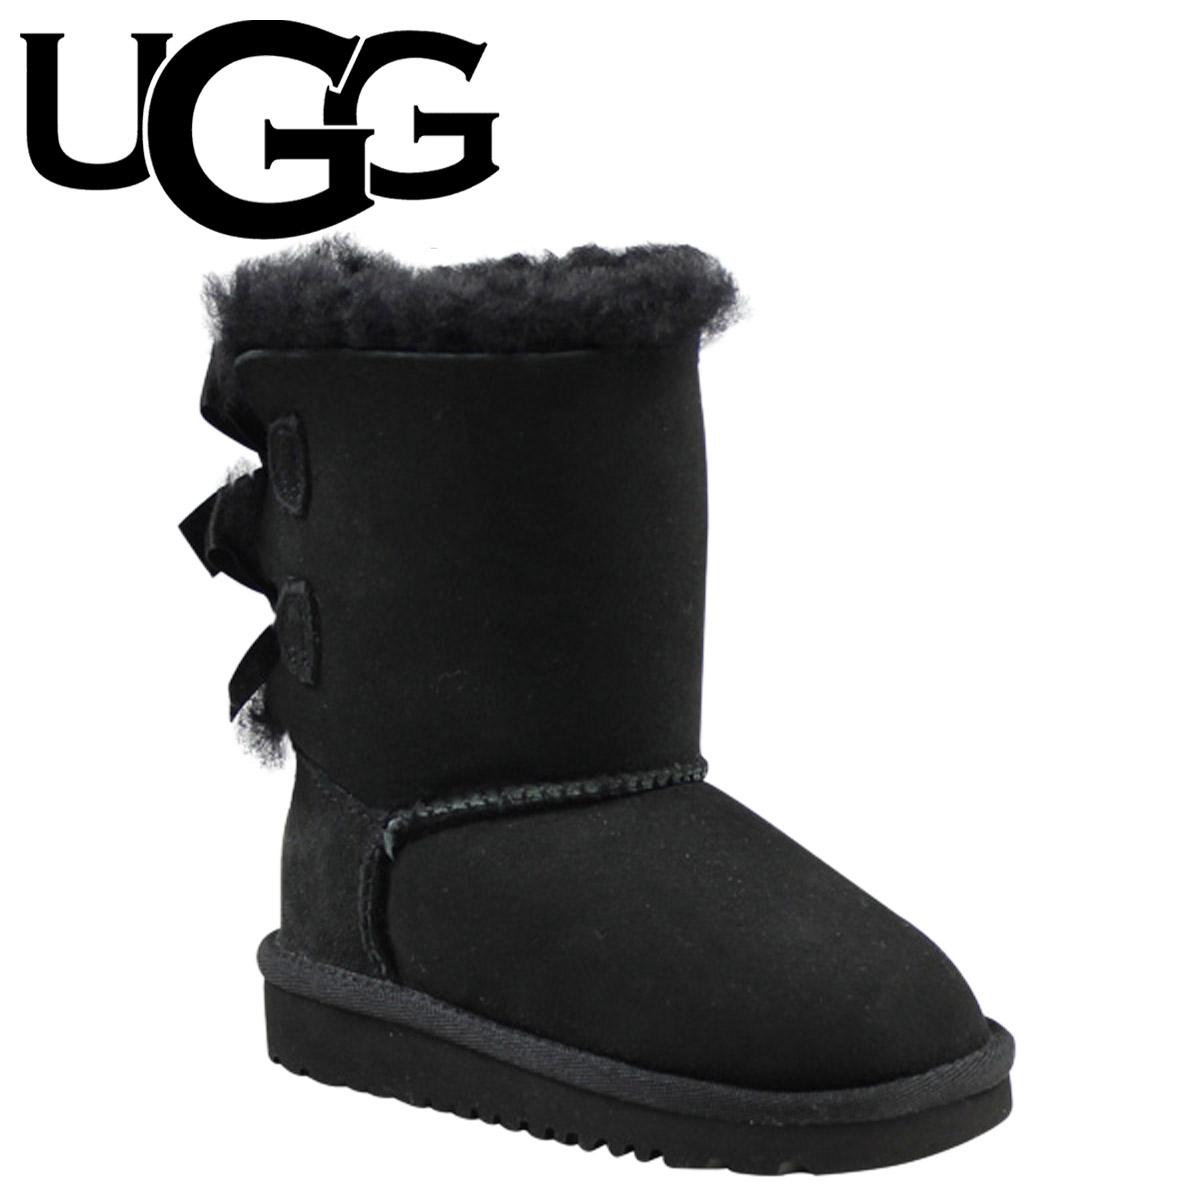 black bow uggs kids nz